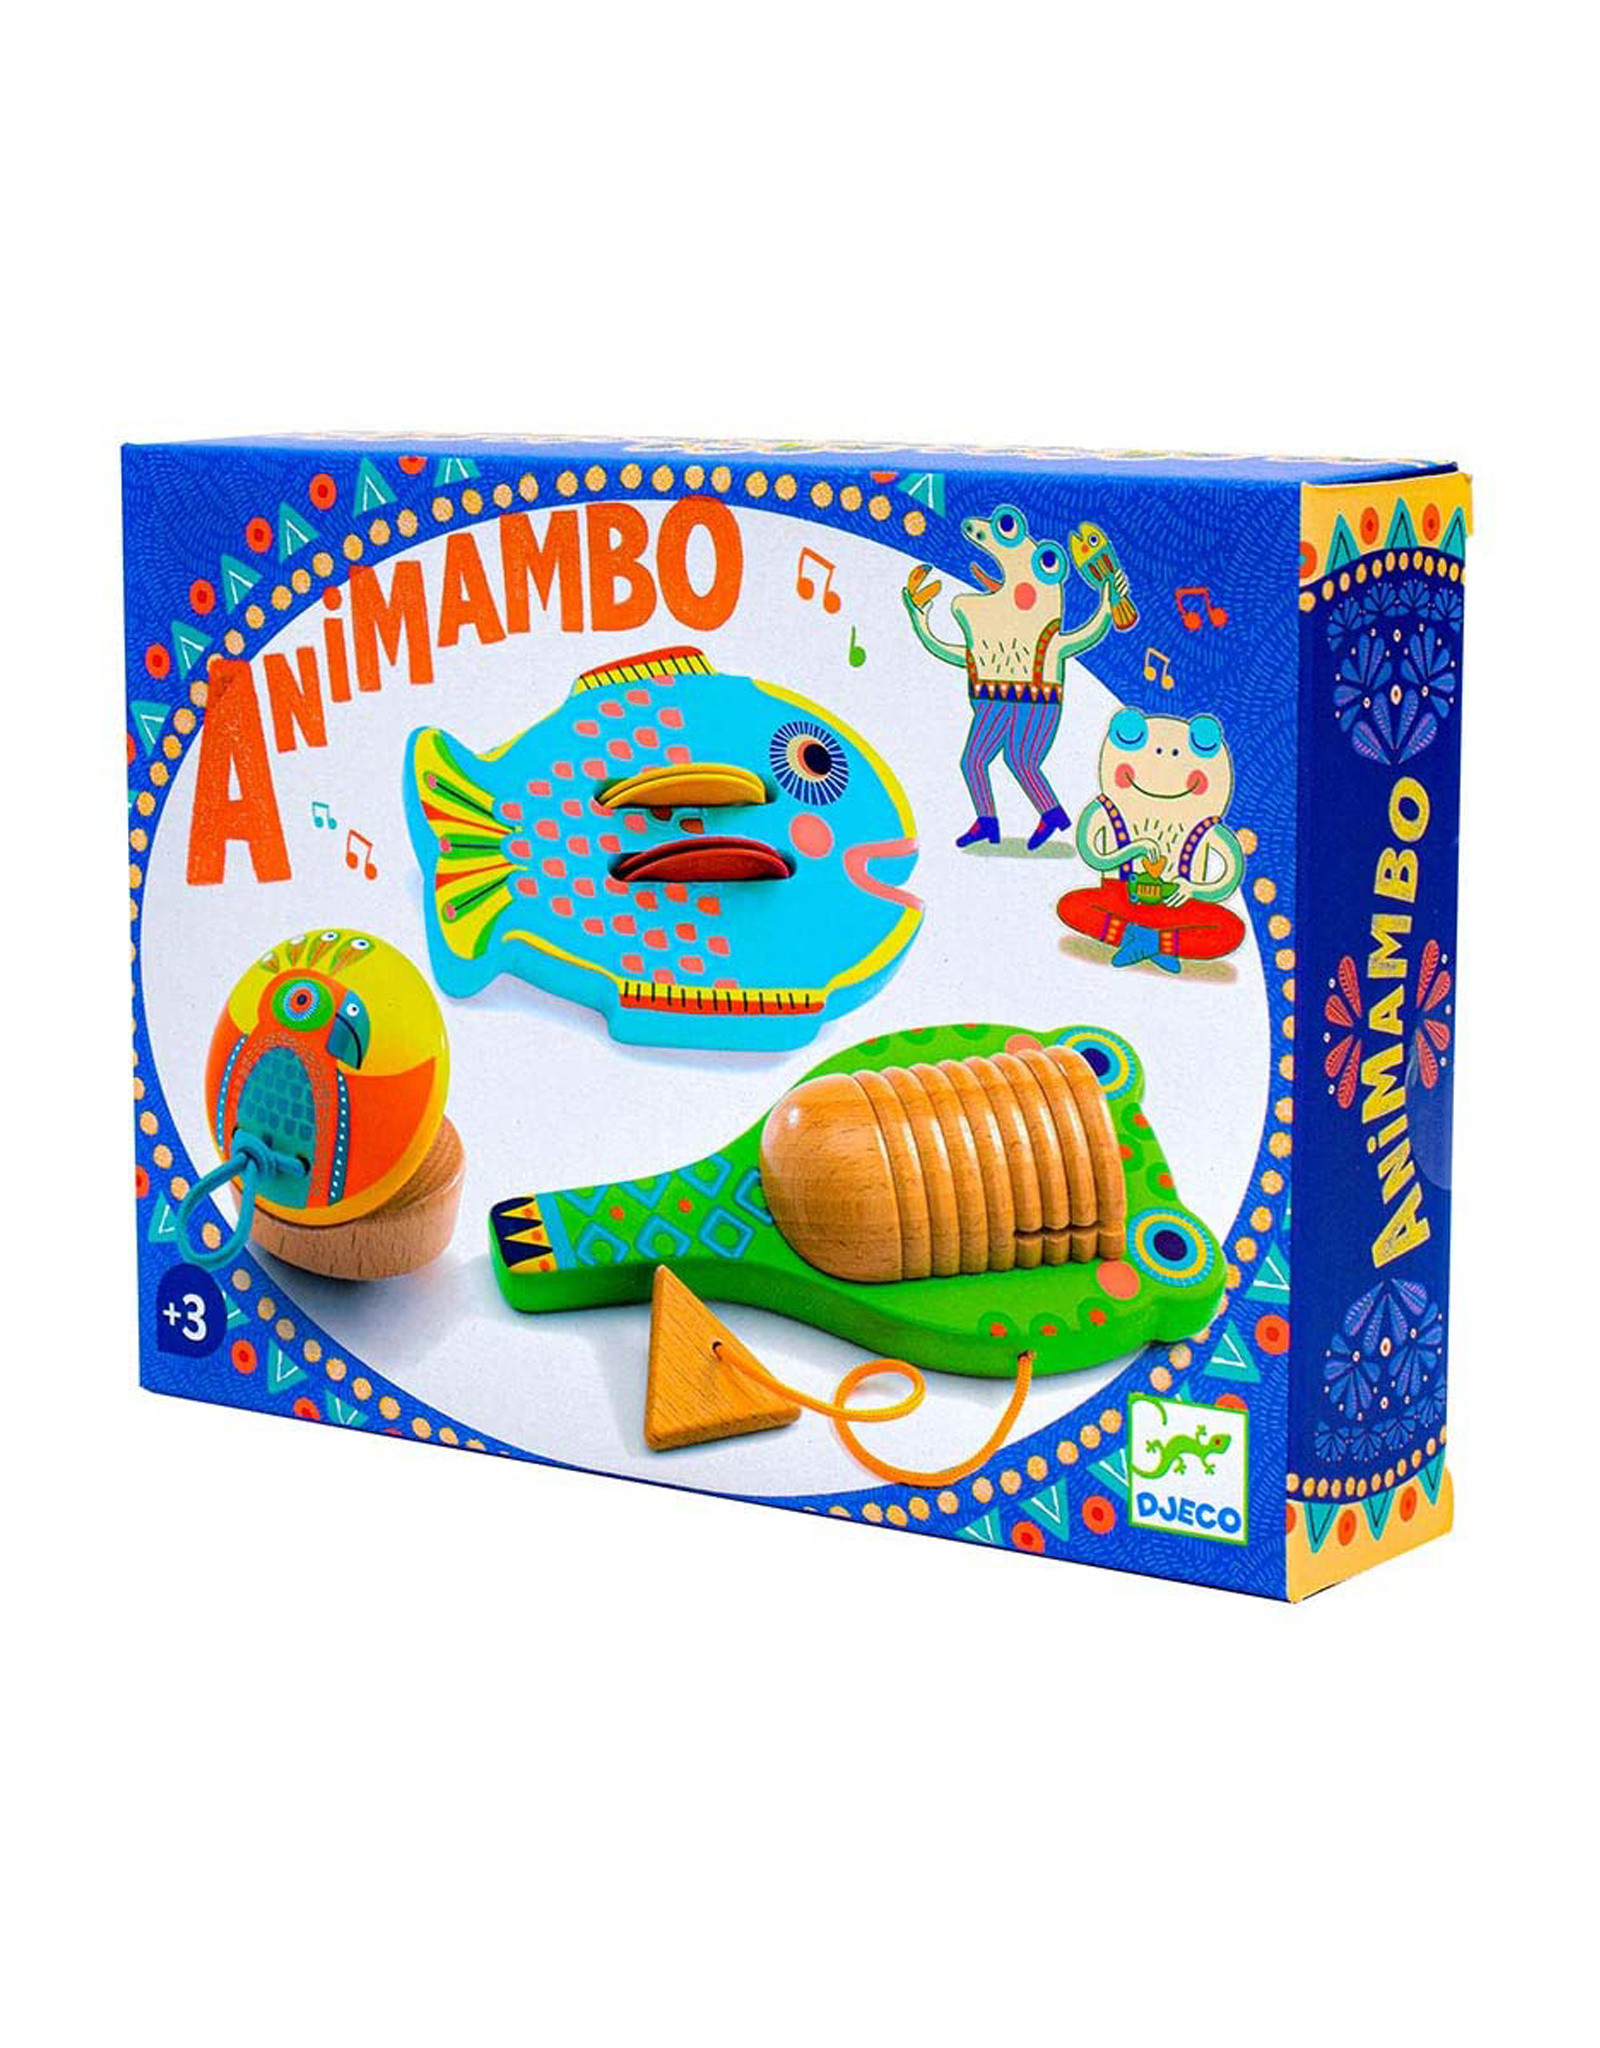 Animambo Percussion Set